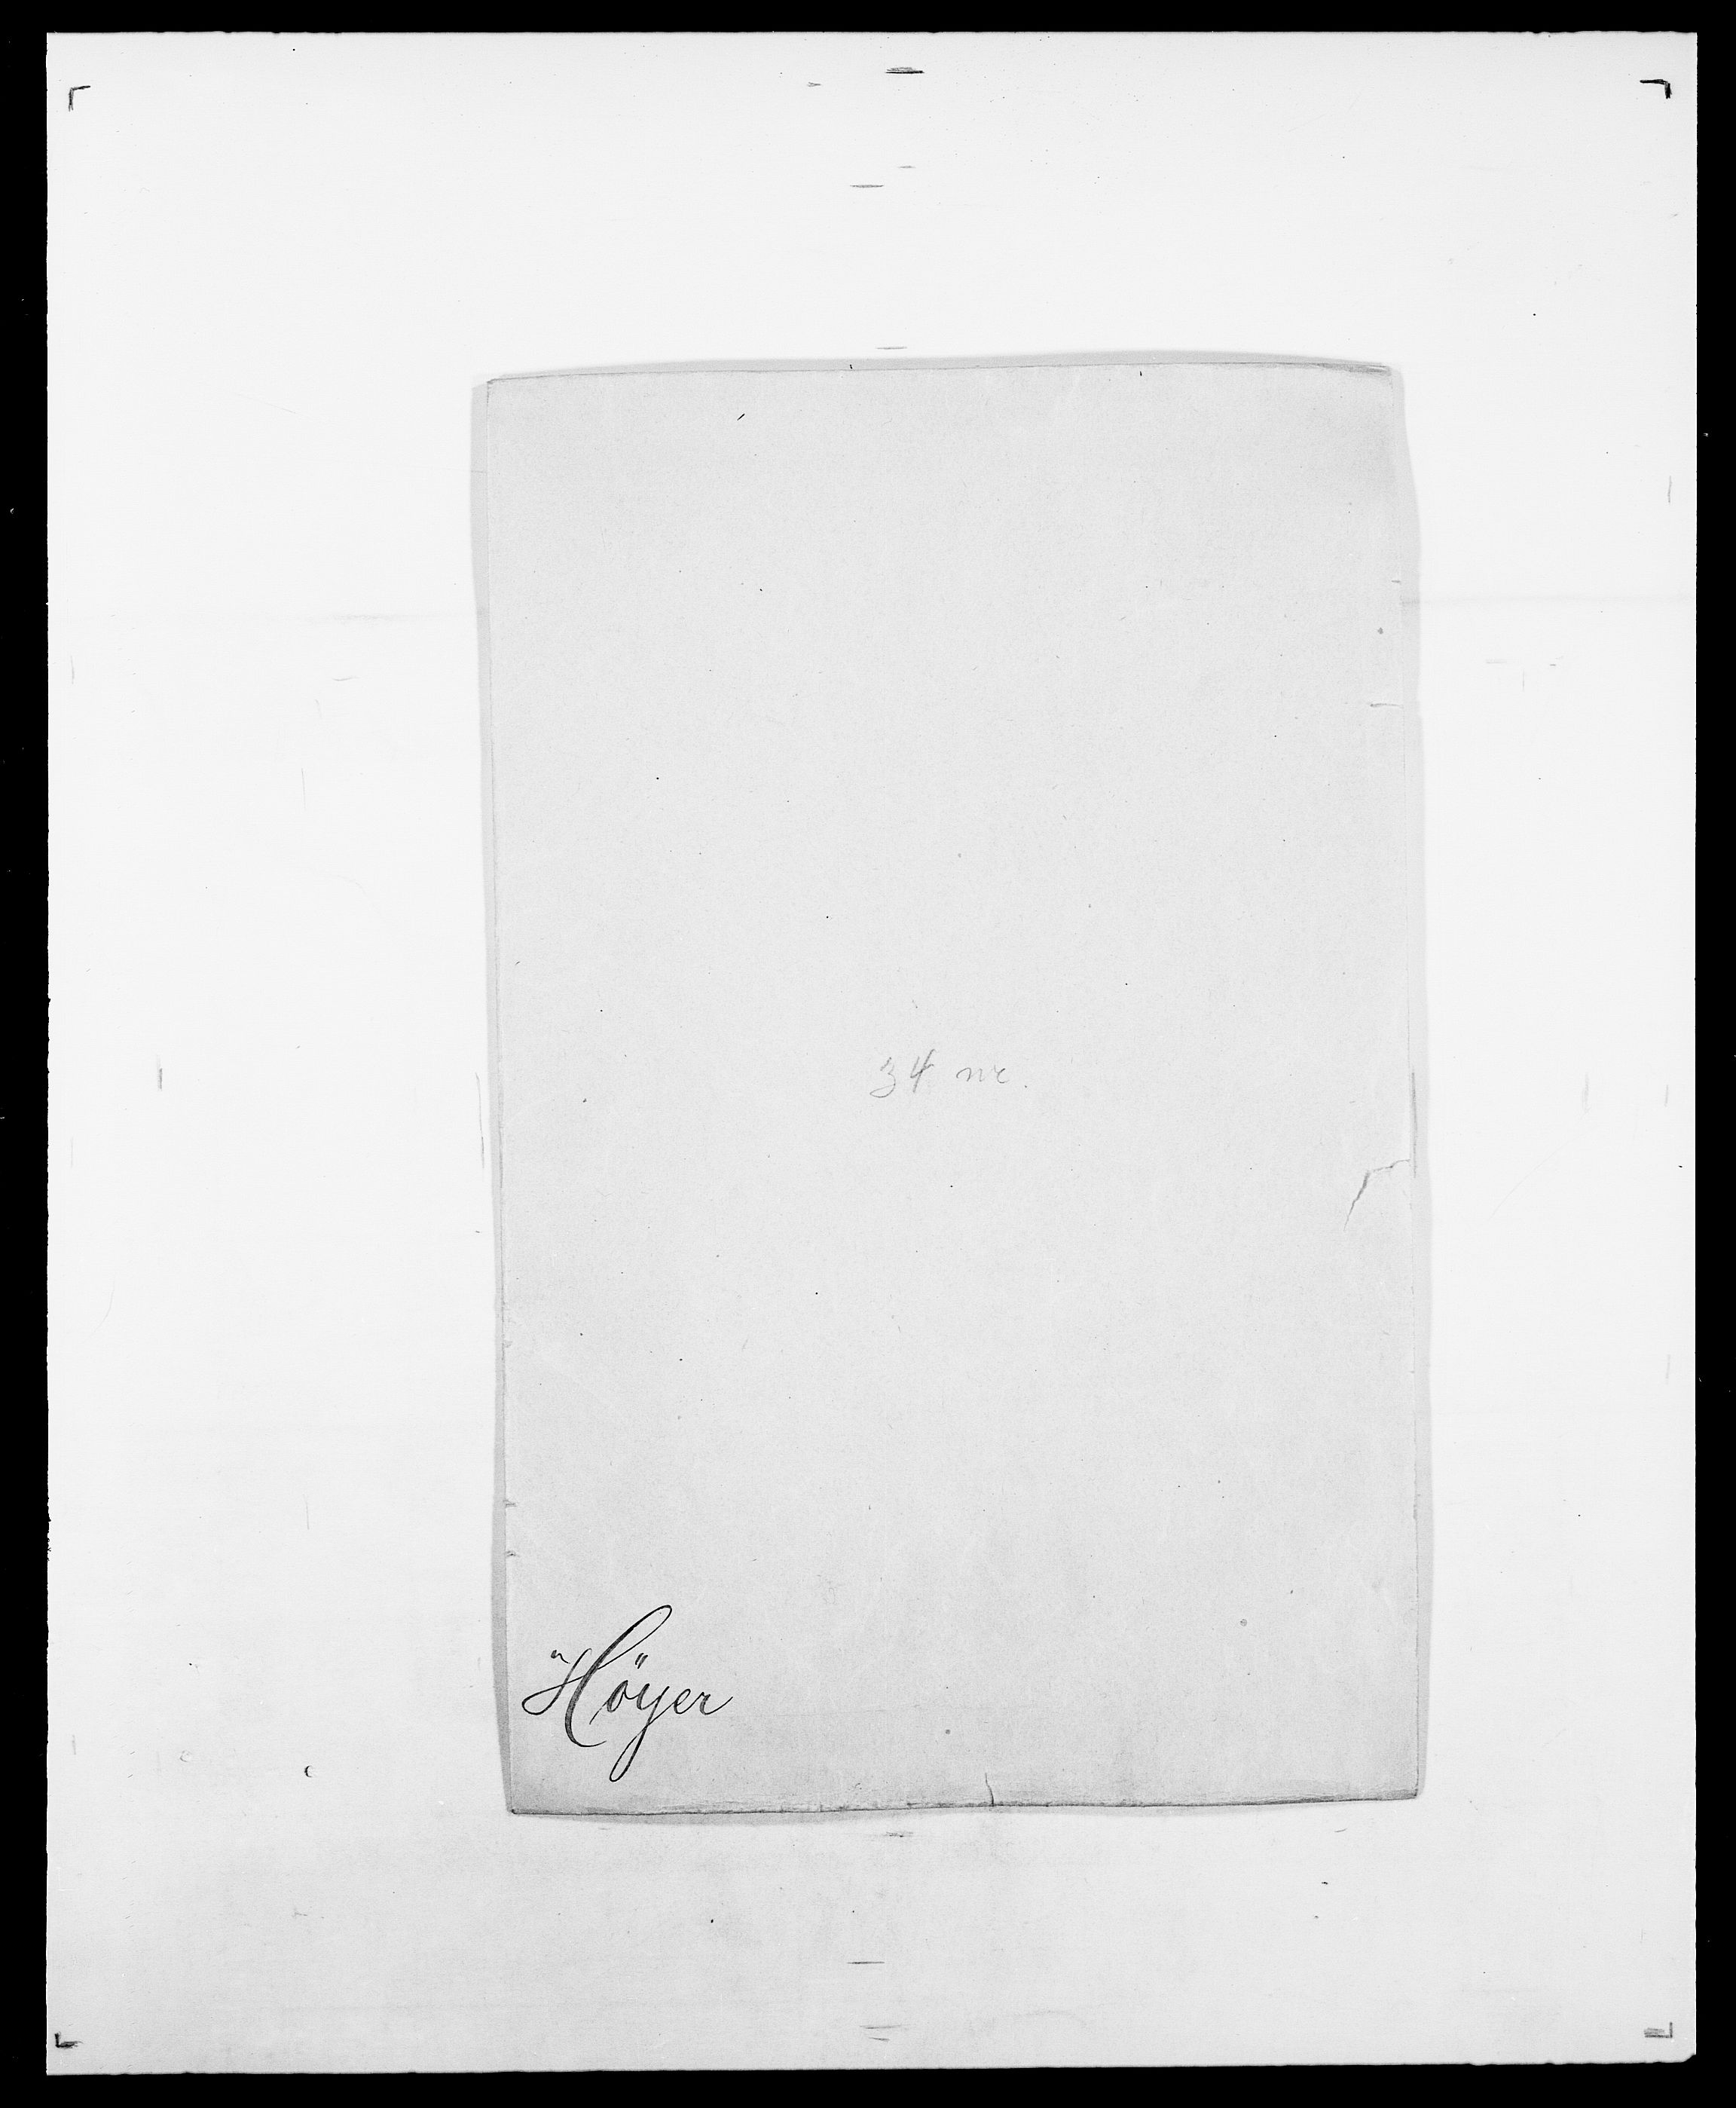 SAO, Delgobe, Charles Antoine - samling, D/Da/L0019: van der Hude - Joys, s. 415